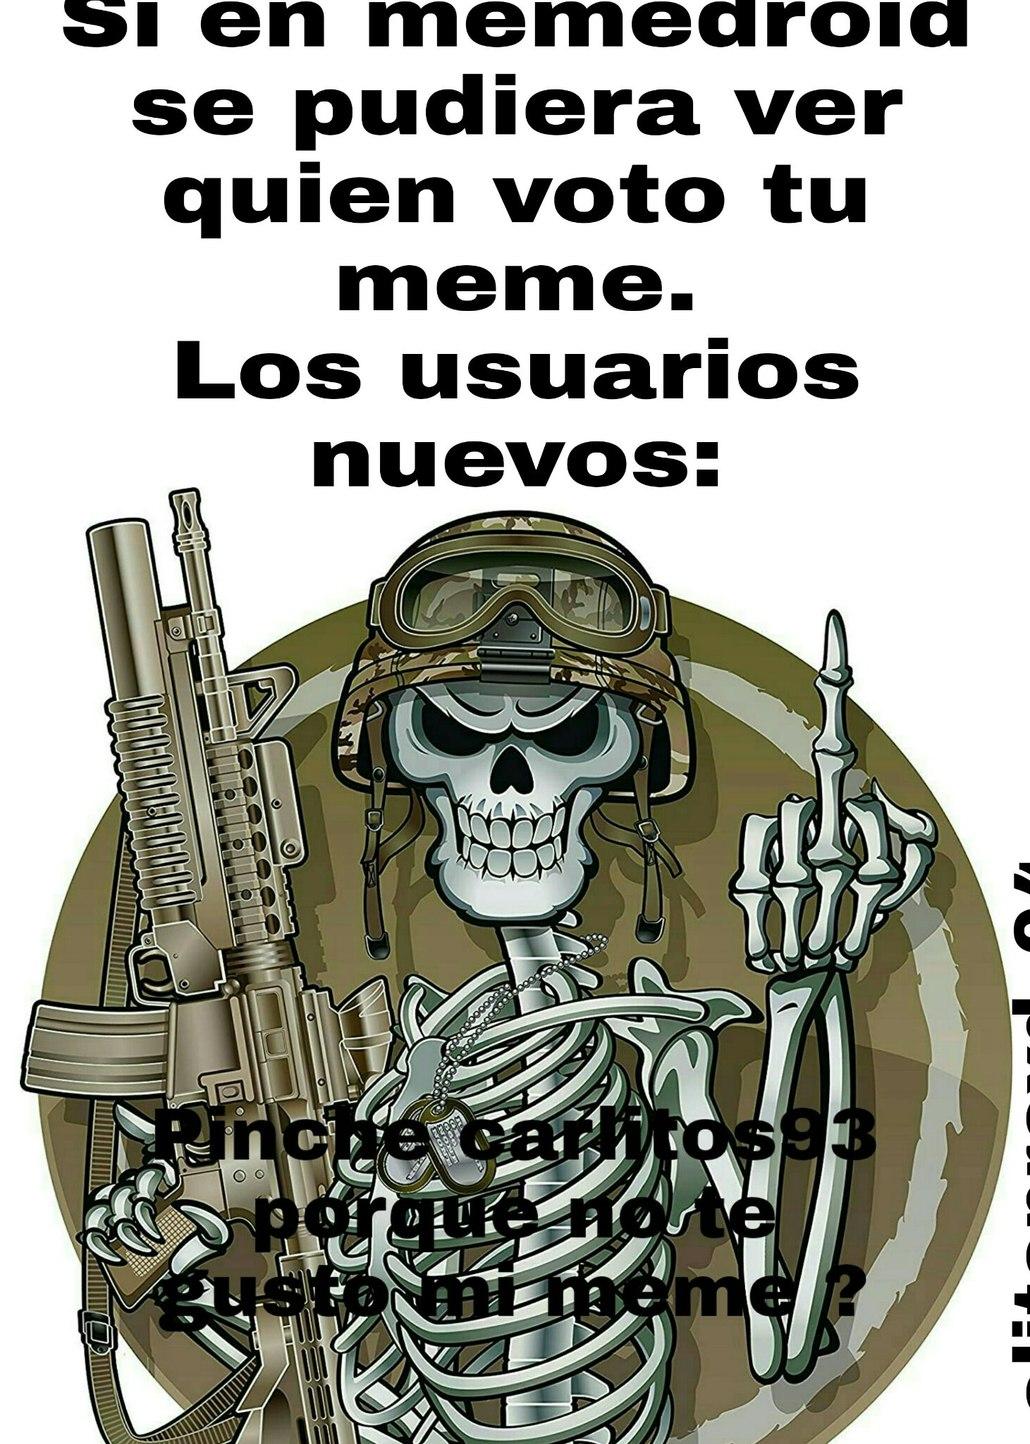 El titulo se fue a matar a carlitos93 - meme